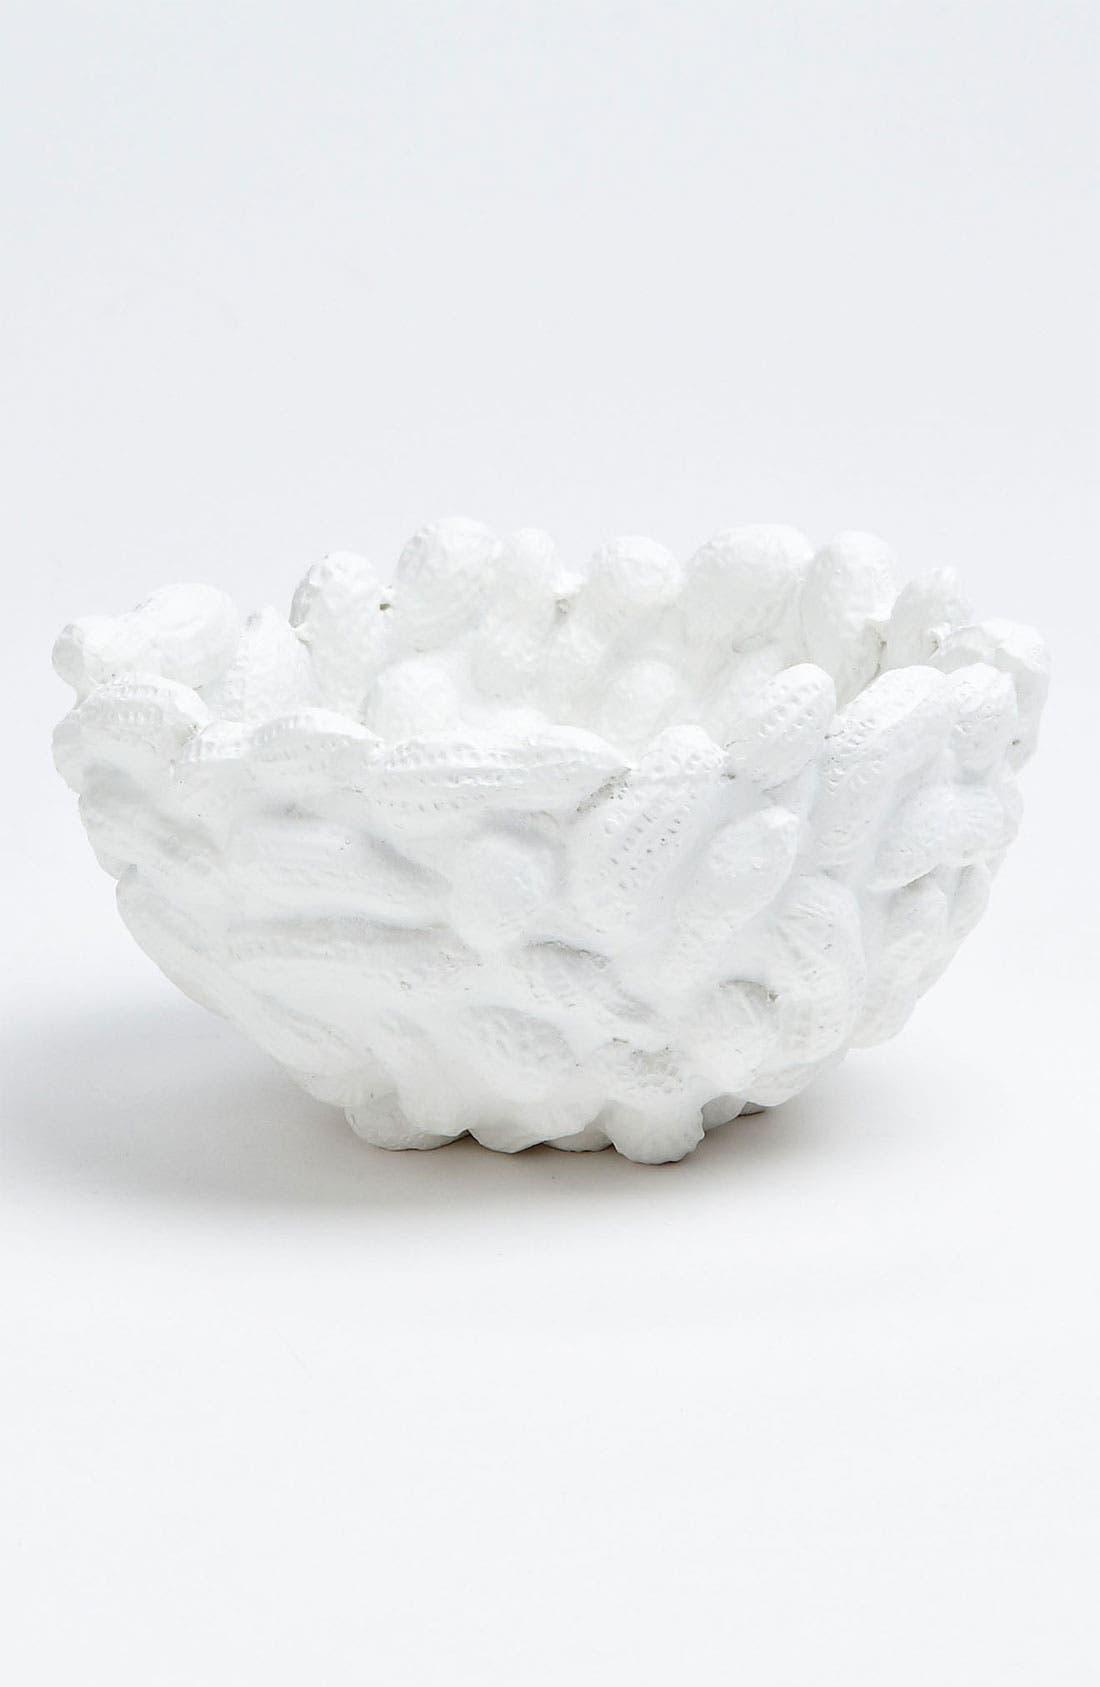 Alternate Image 1 Selected - Peanut Bowl